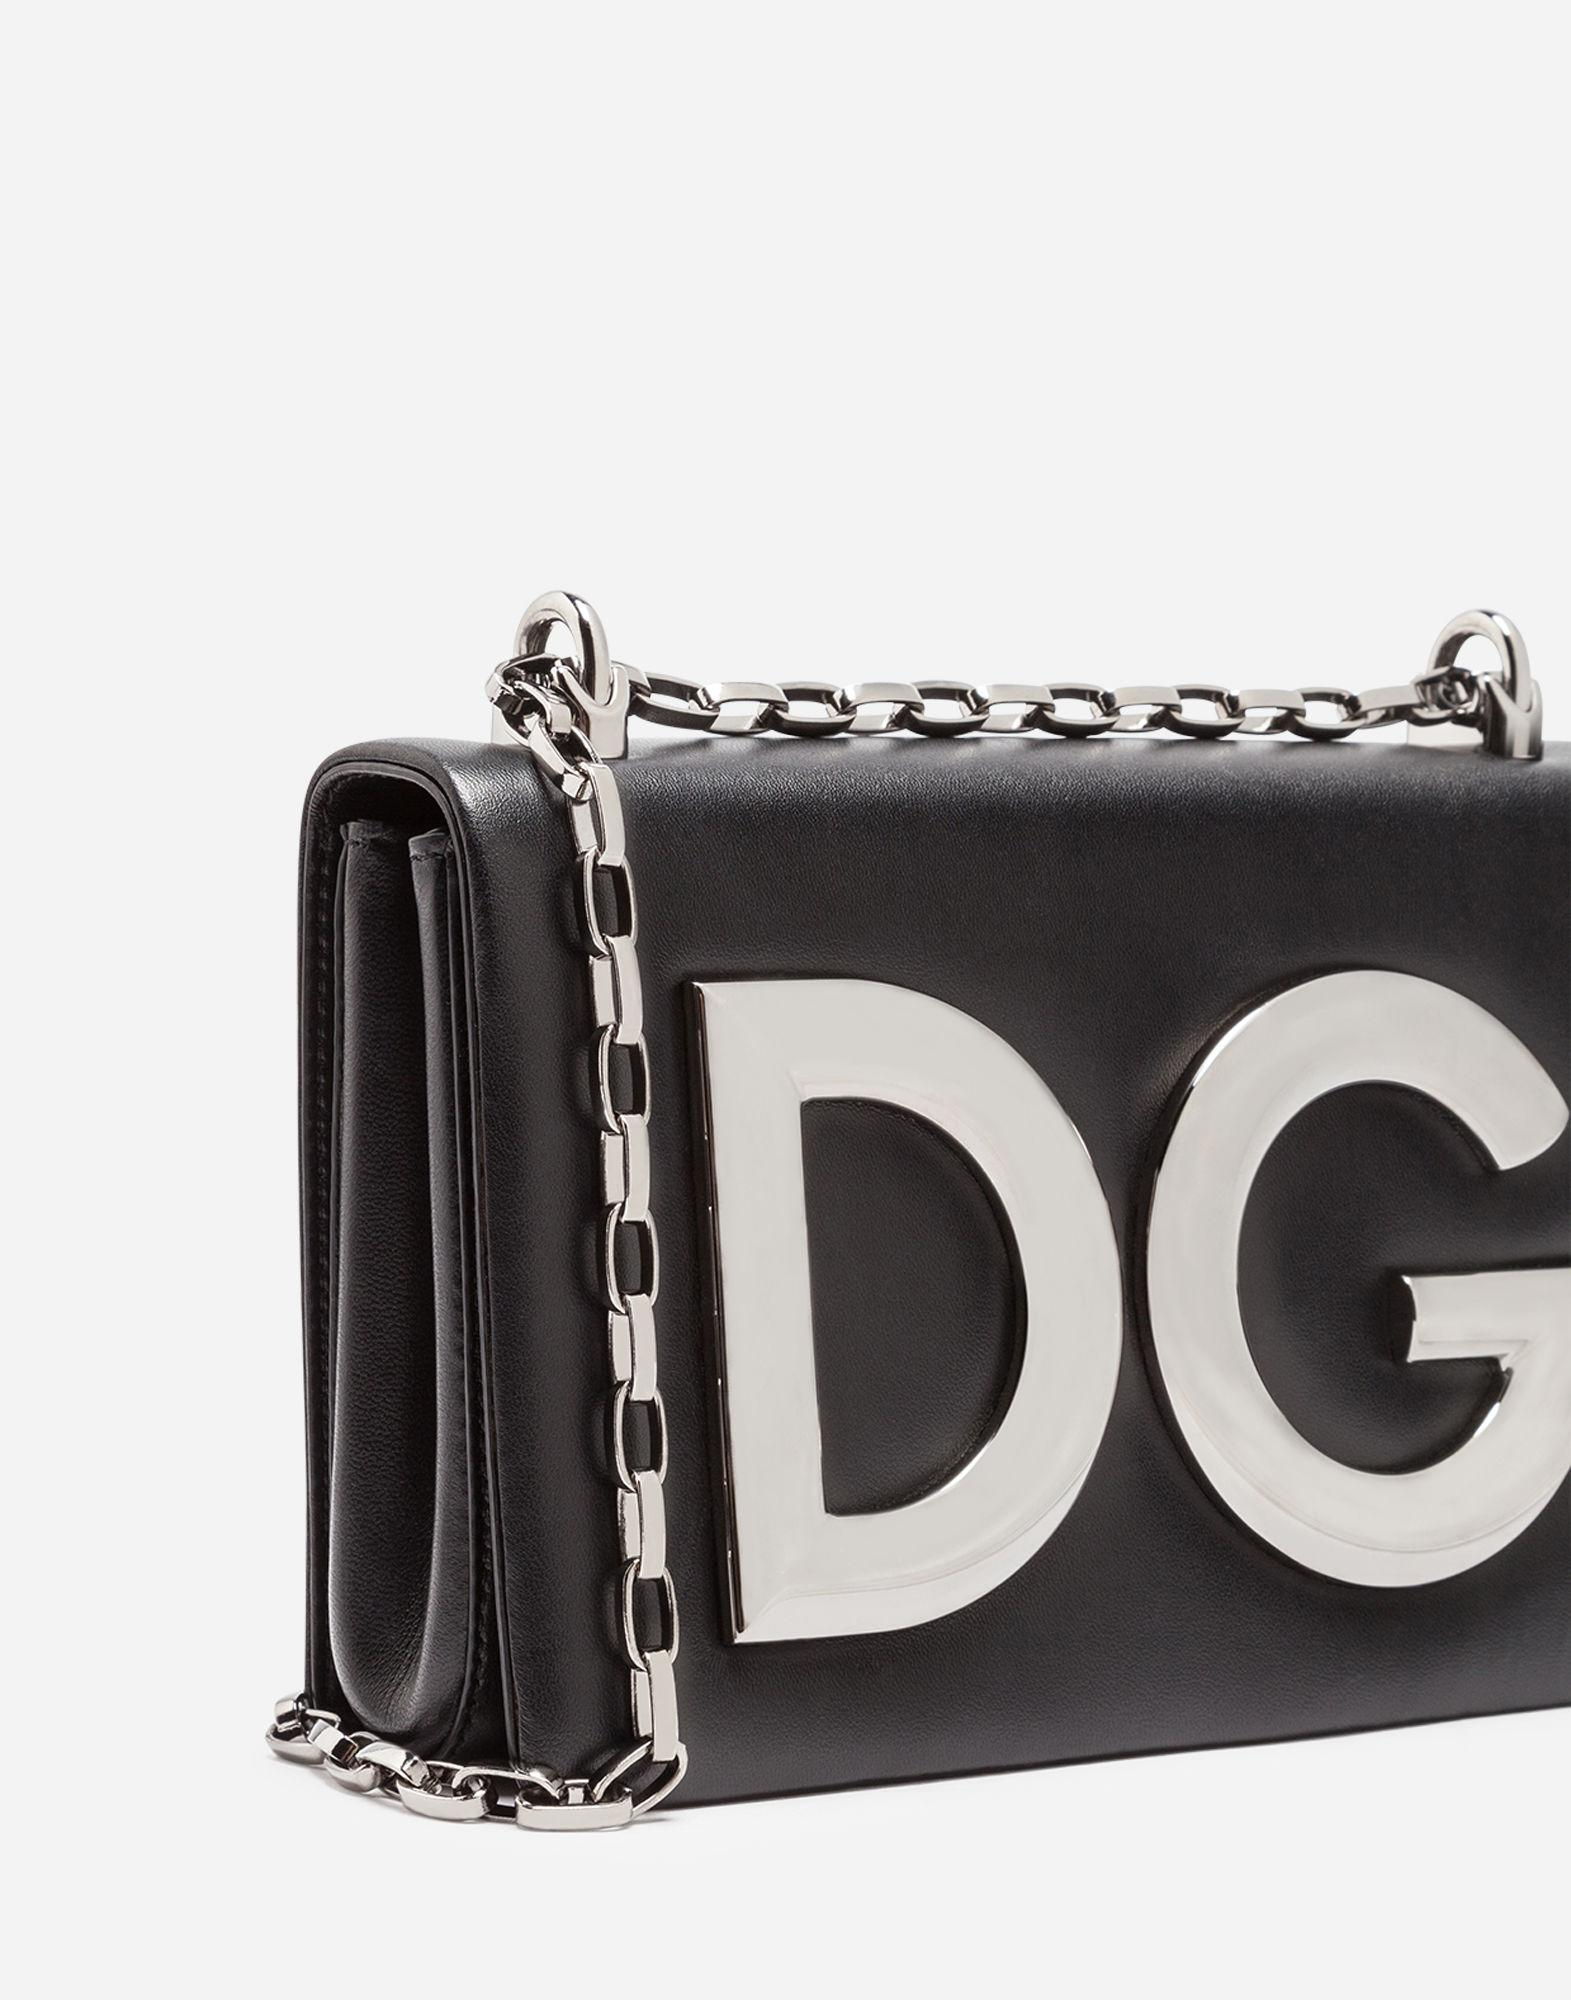 Black Dolce Girls Dg Gabbana Bolso CPqvx5ZU